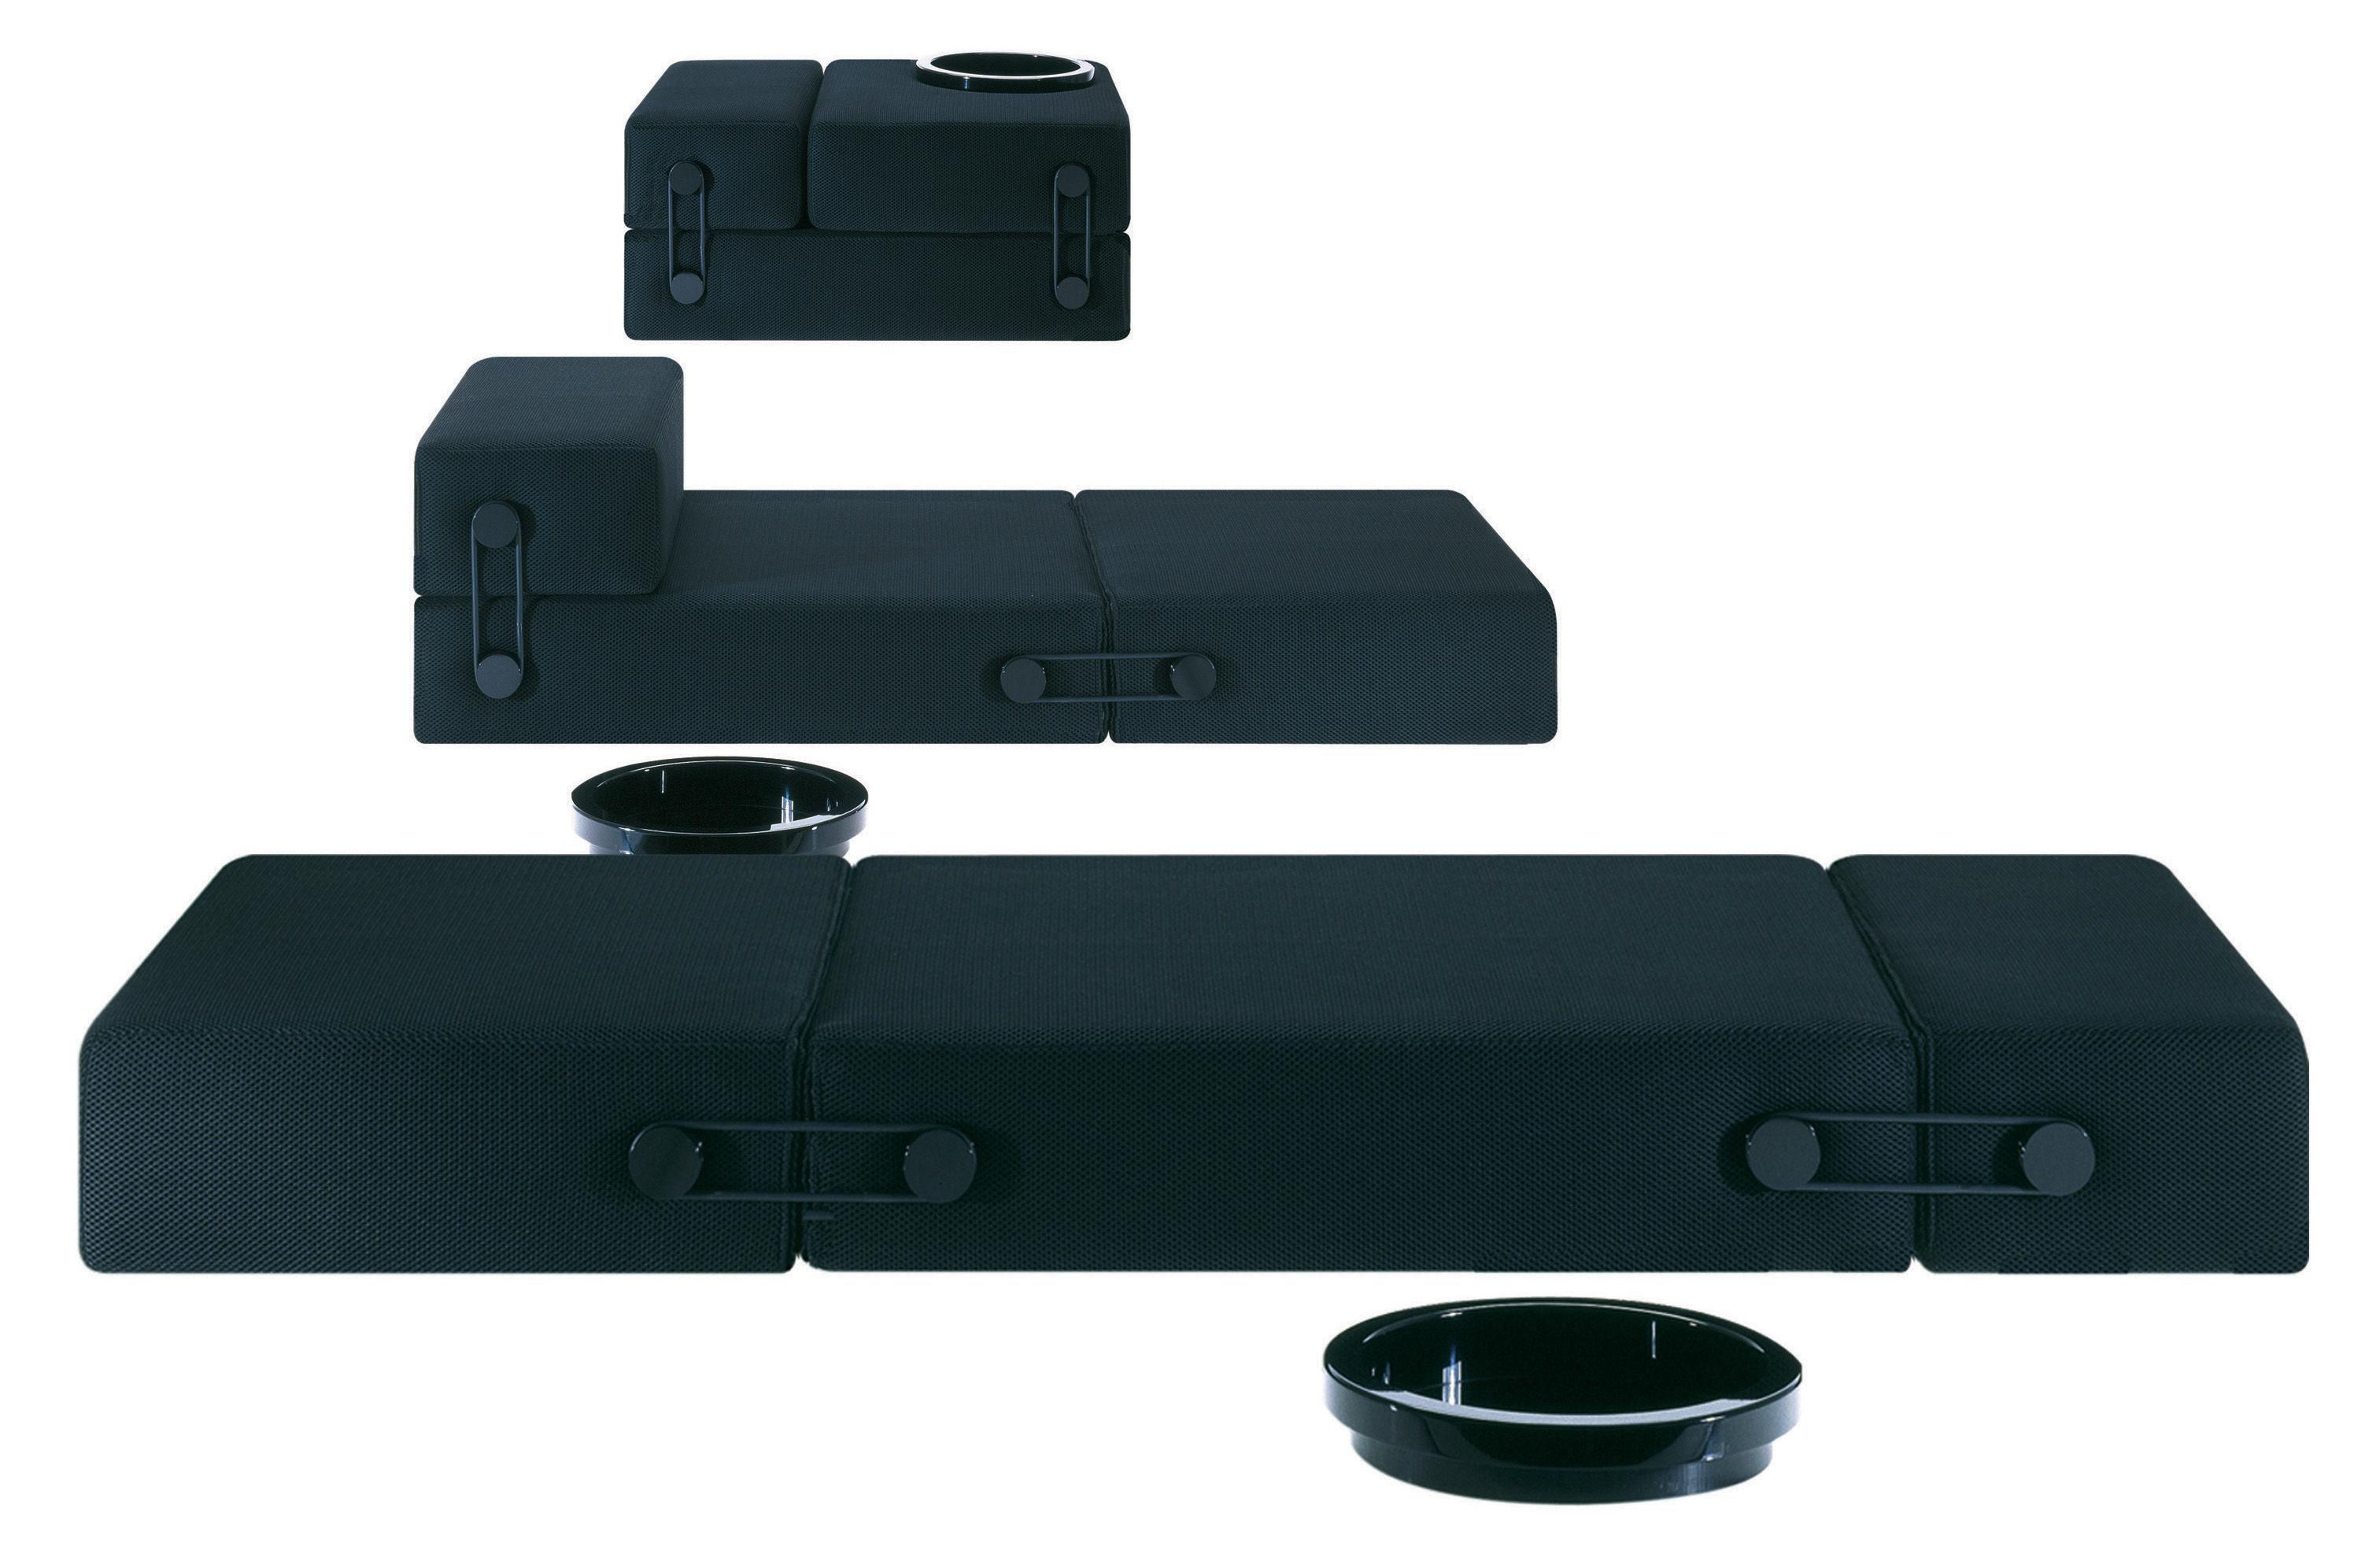 chauffeuse convertible trix lit d 39 appoint noir kartell. Black Bedroom Furniture Sets. Home Design Ideas